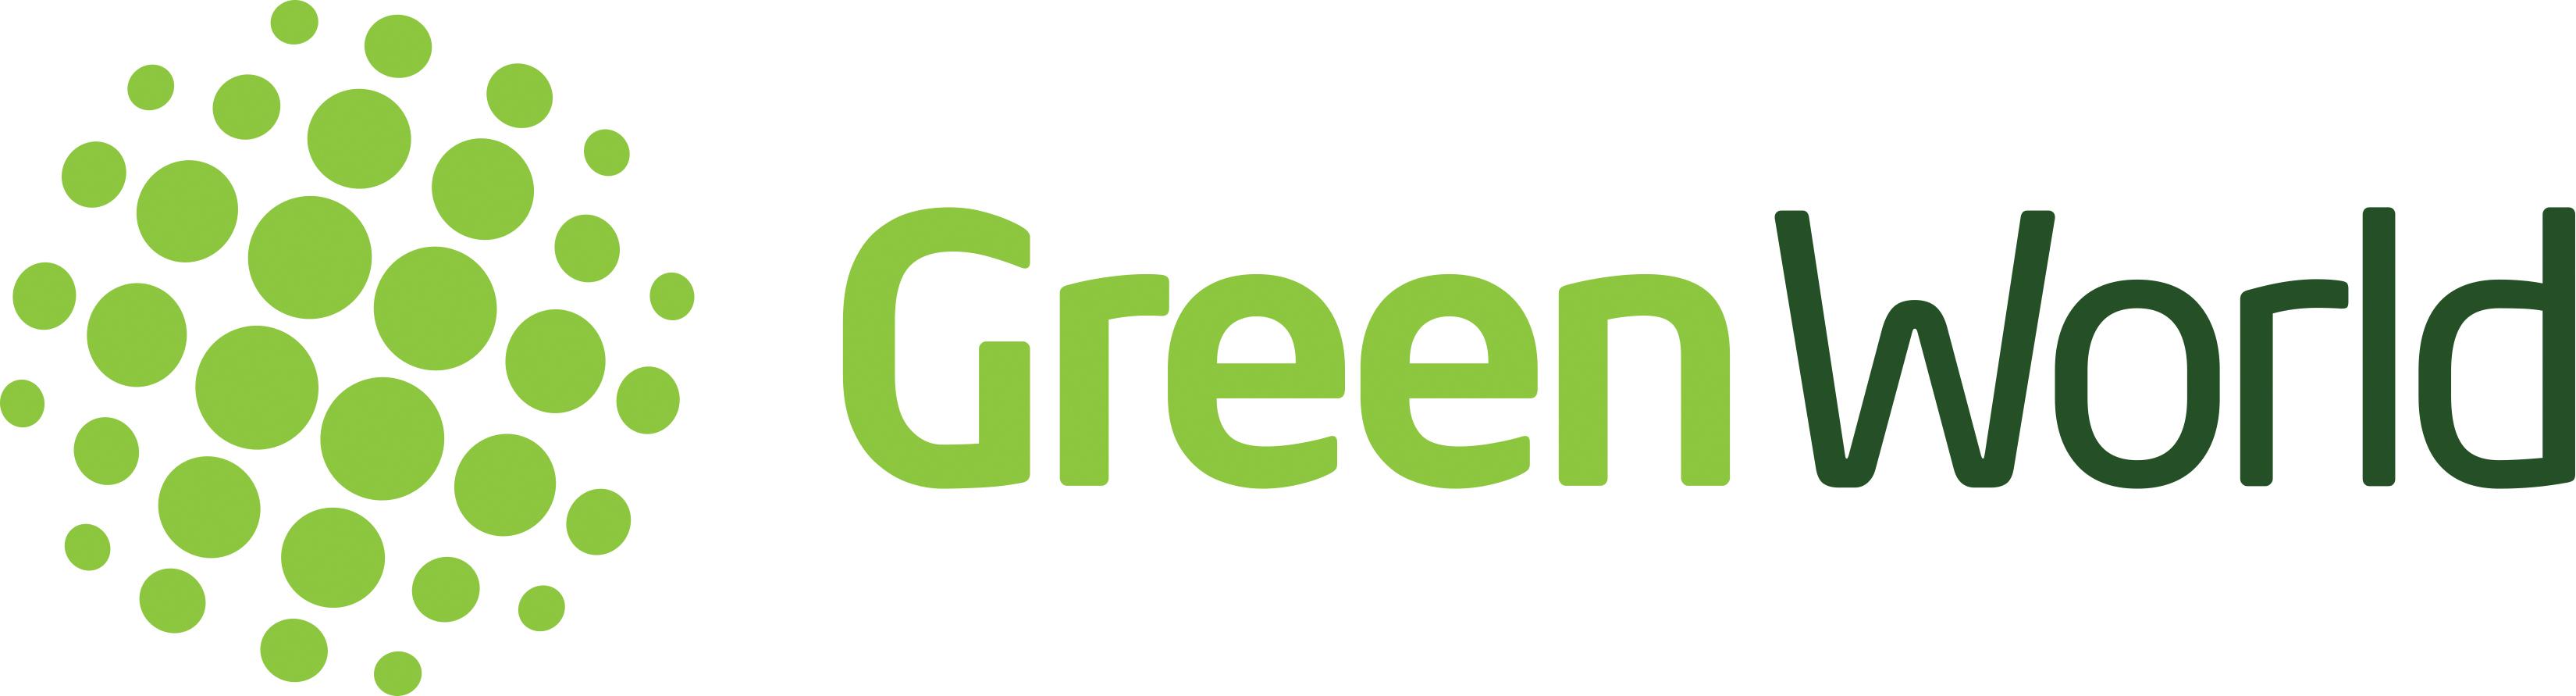 Green world logo stock vector. Illustration of abstract ... |Green World Logo